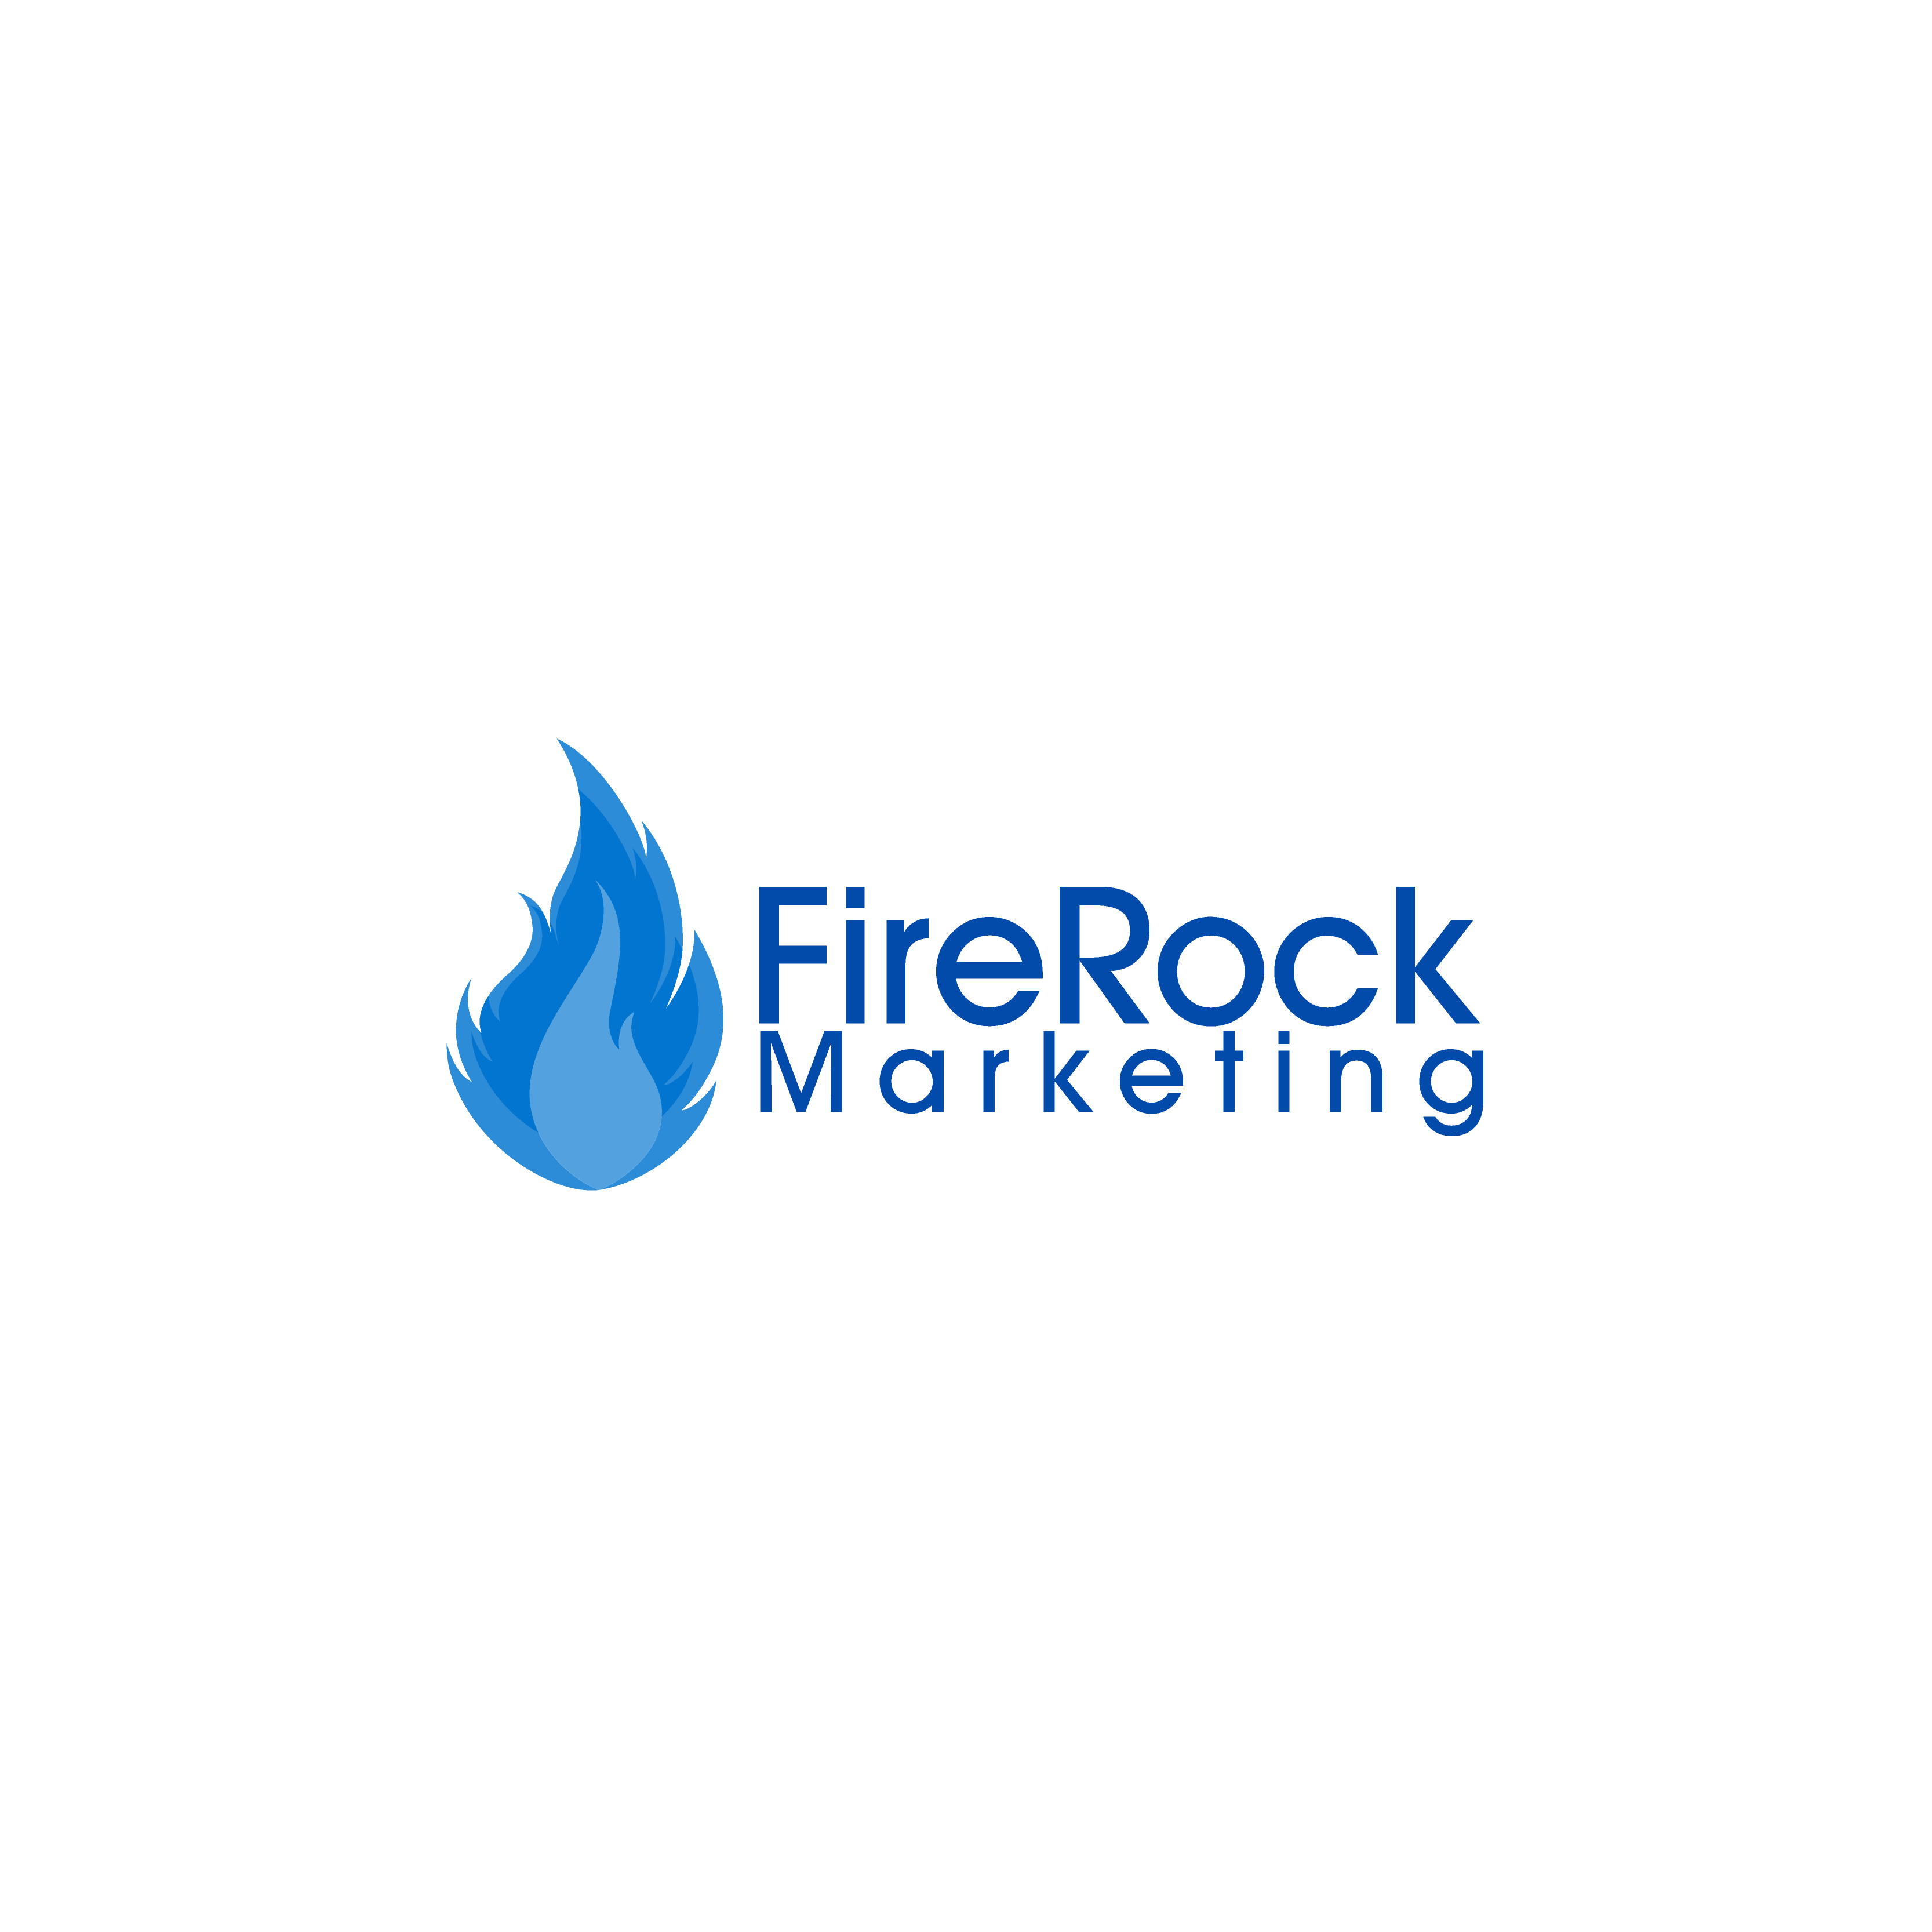 FireRock Marketing